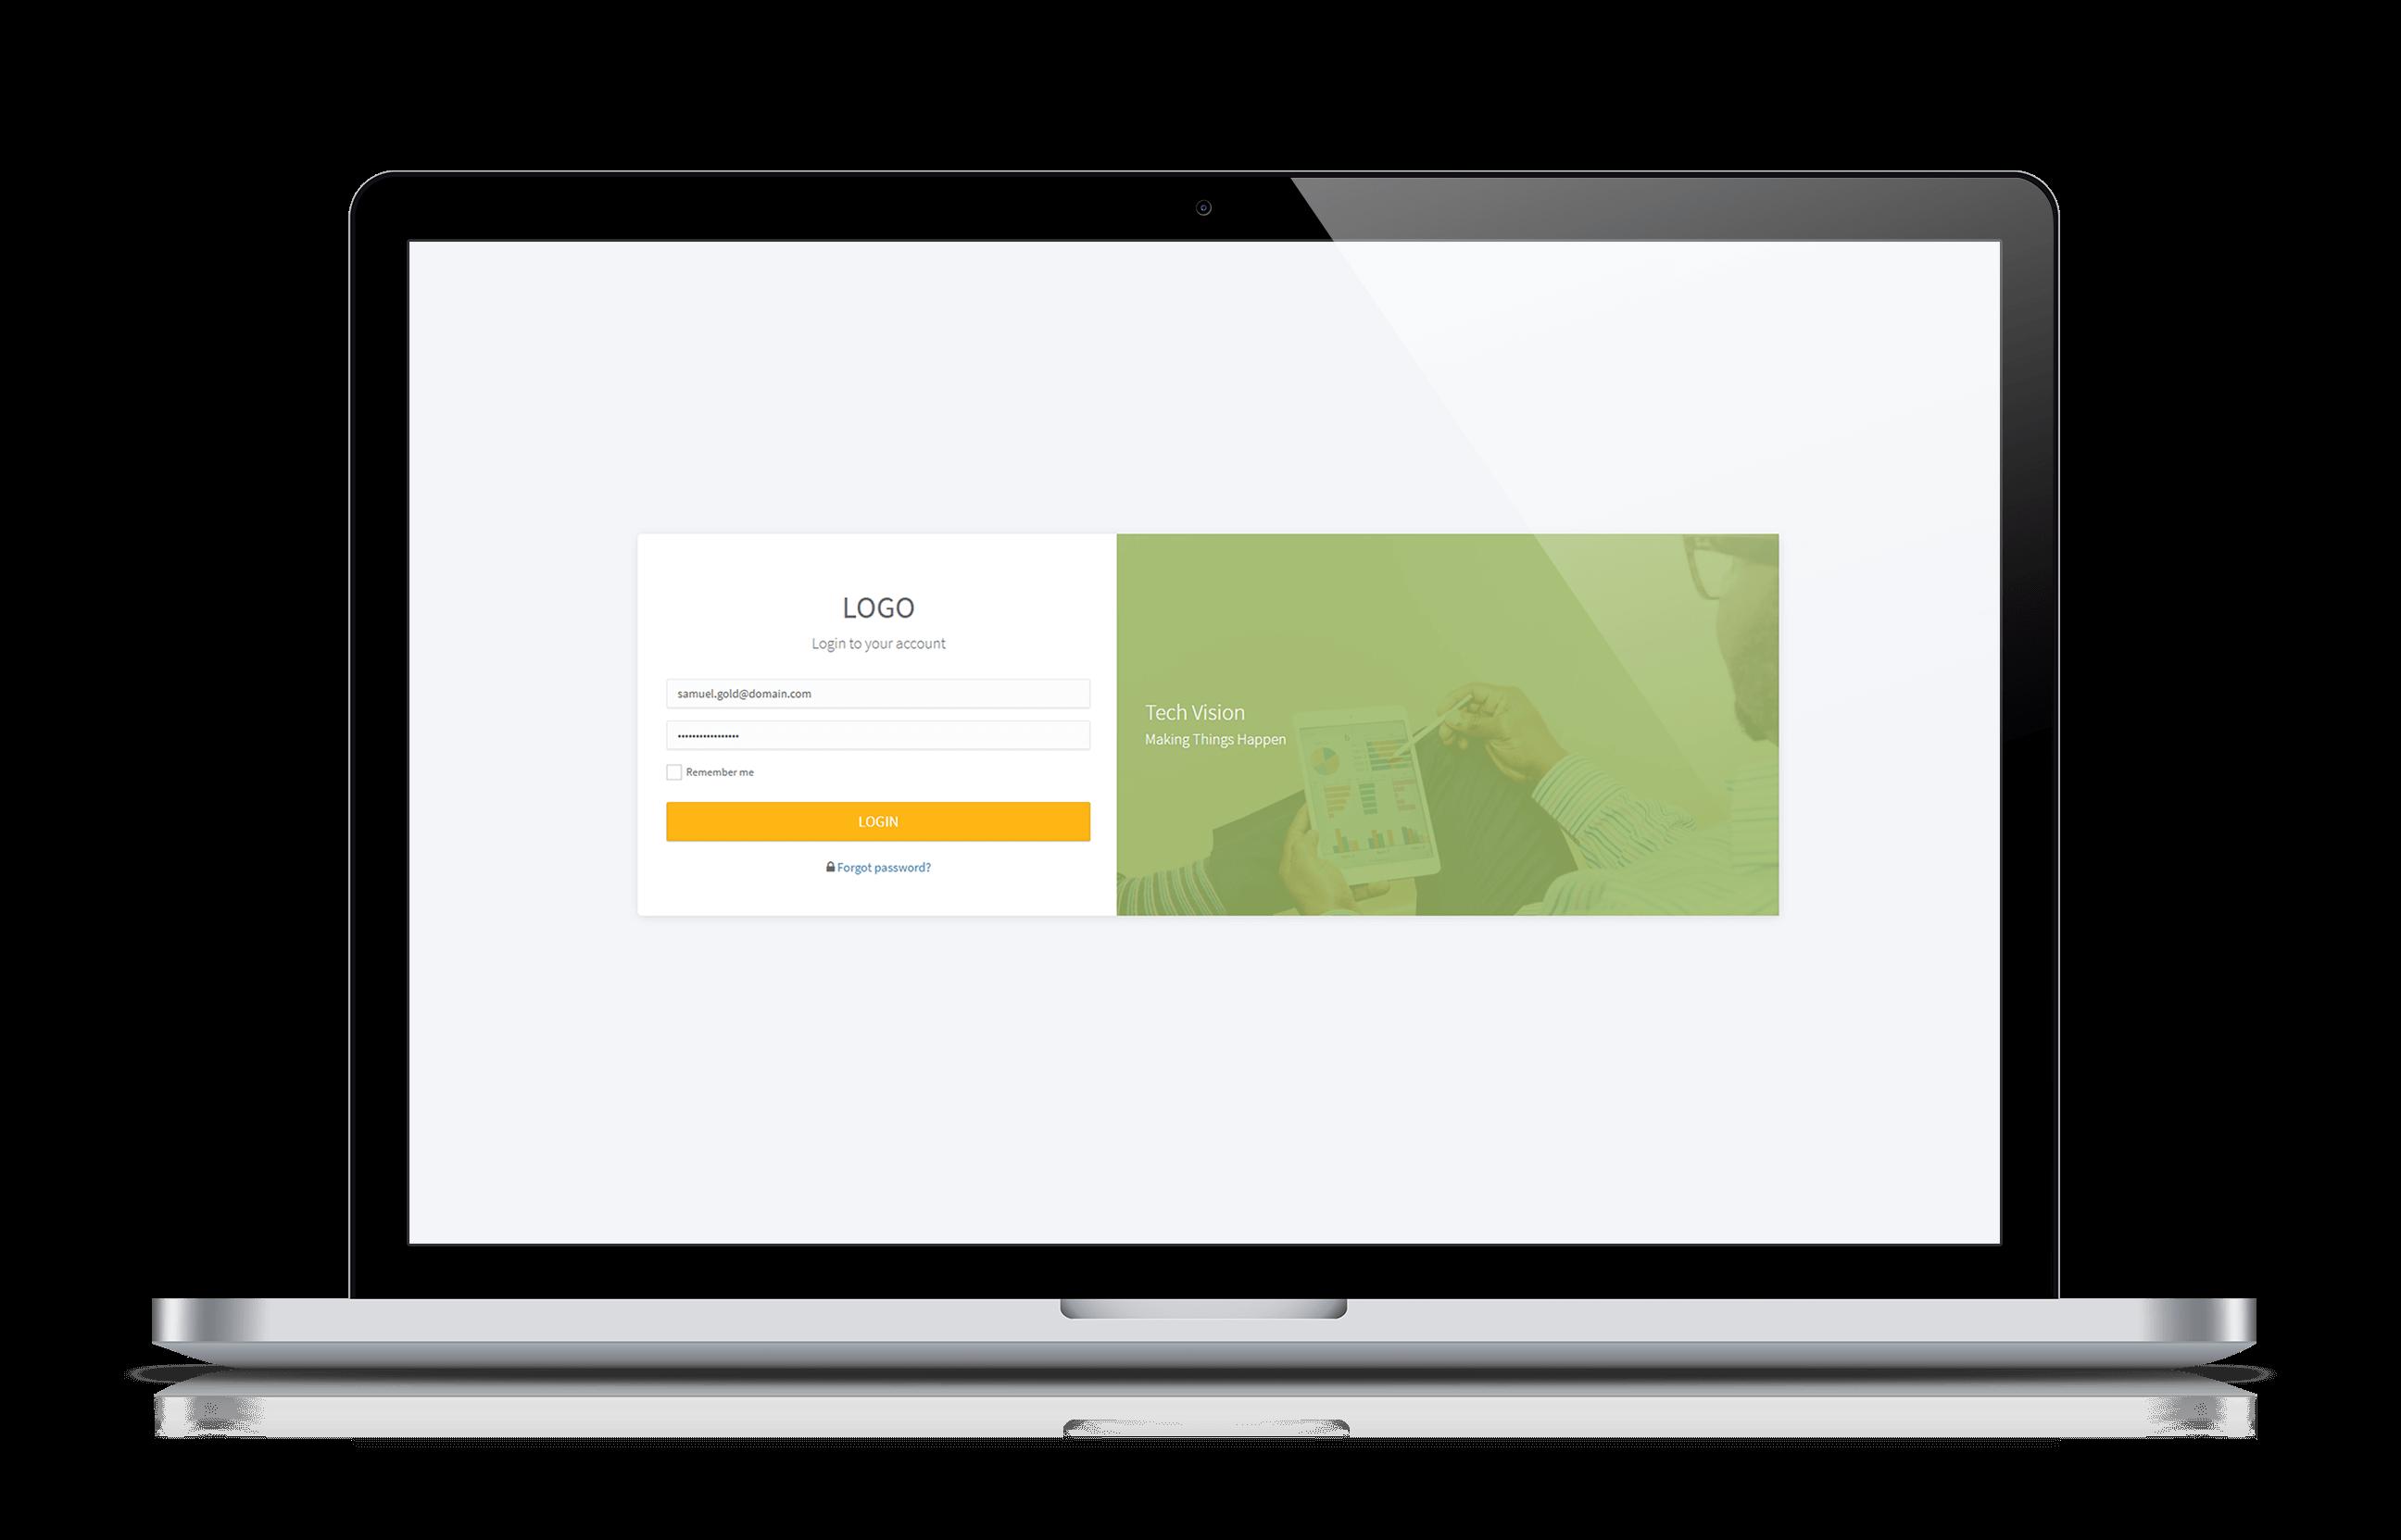 SalesForce Customer Portal Login Page